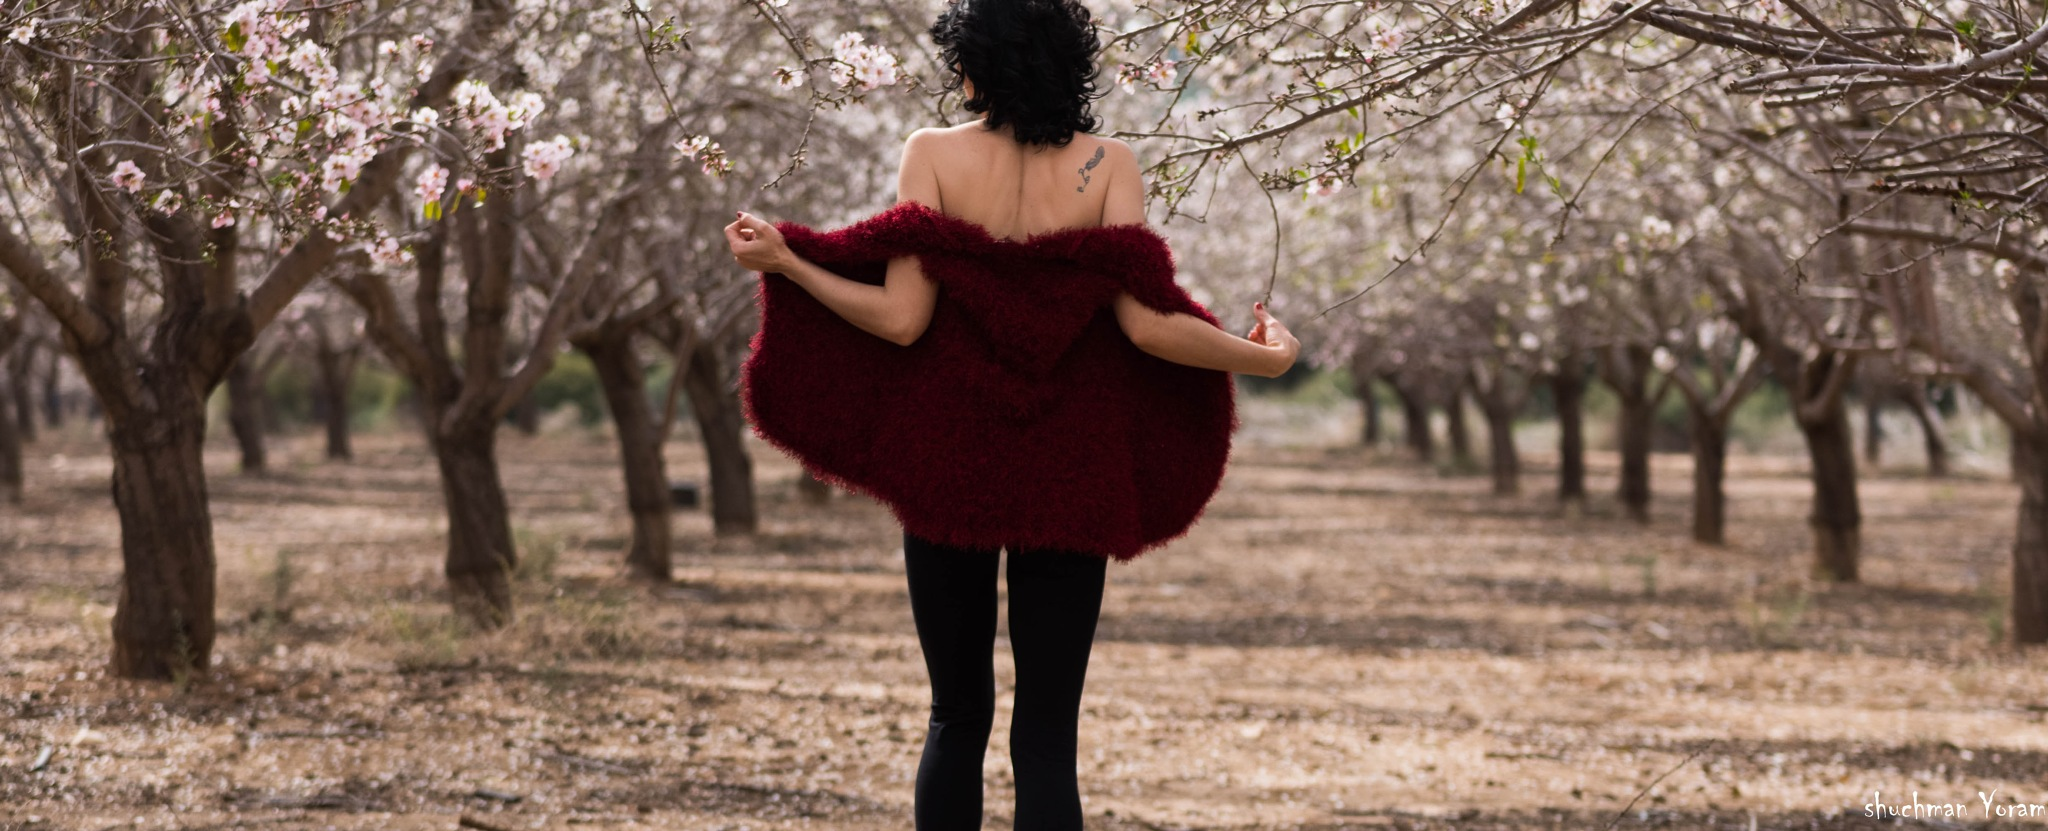 Dancing in the fields by yoram.shuchman